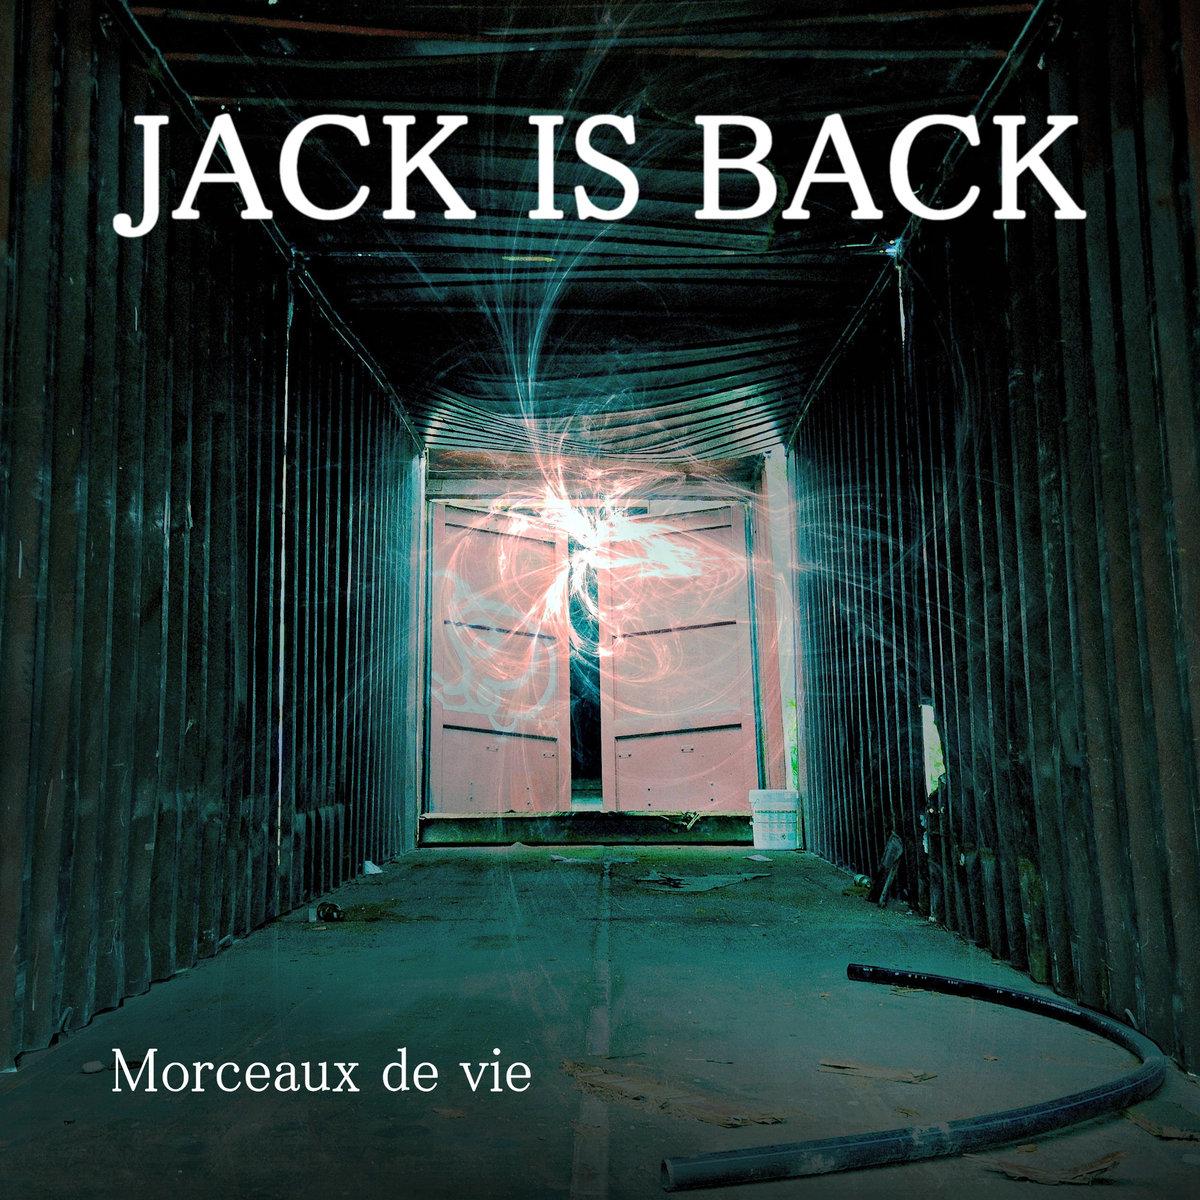 Bio 14a-Jack is back